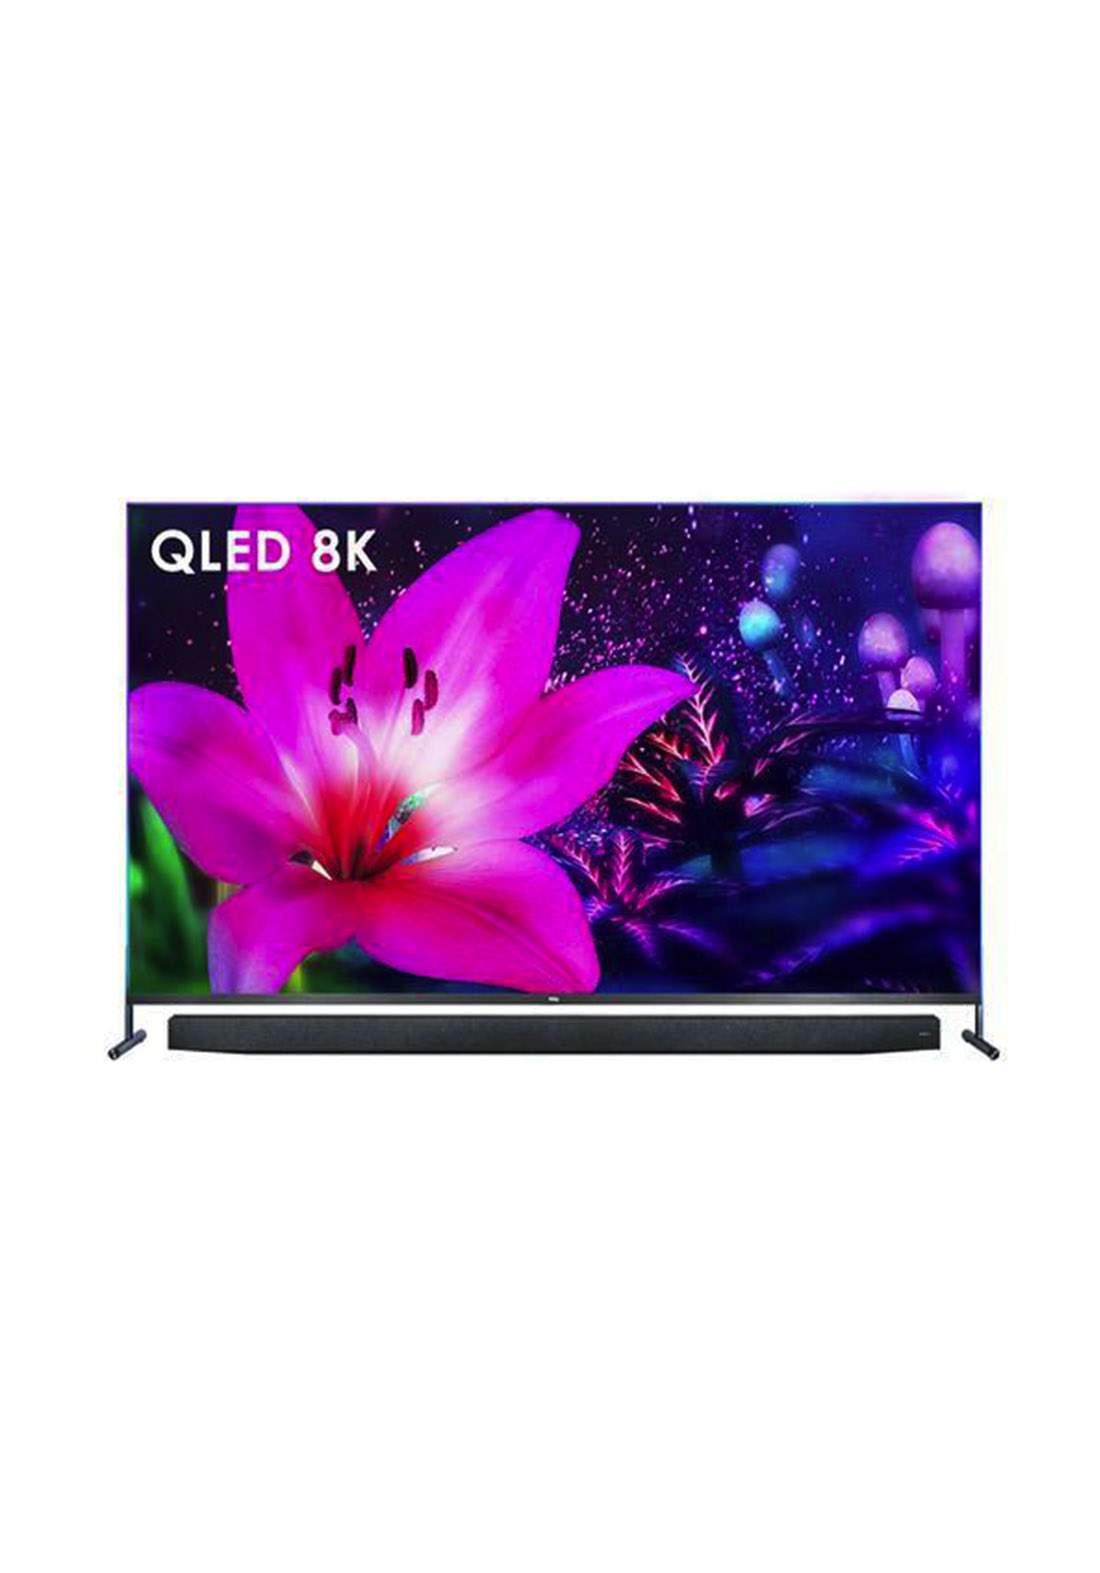 TCL 75X915 75 inch QLED 8K Smart Android TV-  Black شاشة ذكية